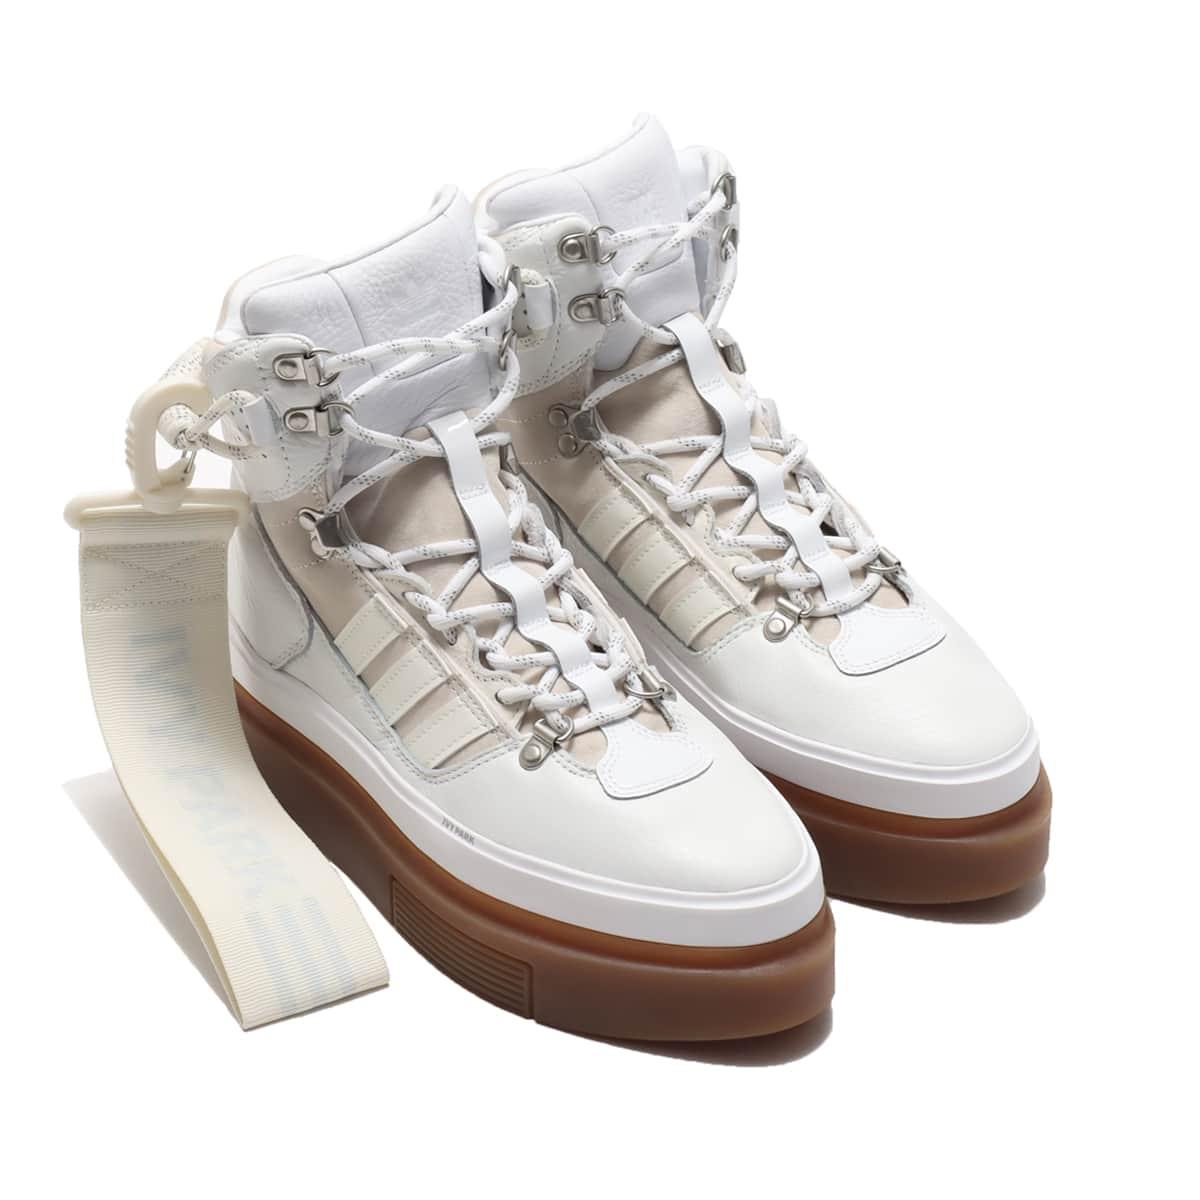 adidas IVP Super Sleek Boot FOOTWEAR WHITE/CORE WHITE/OFF WHITE 21SS-S_photo_large